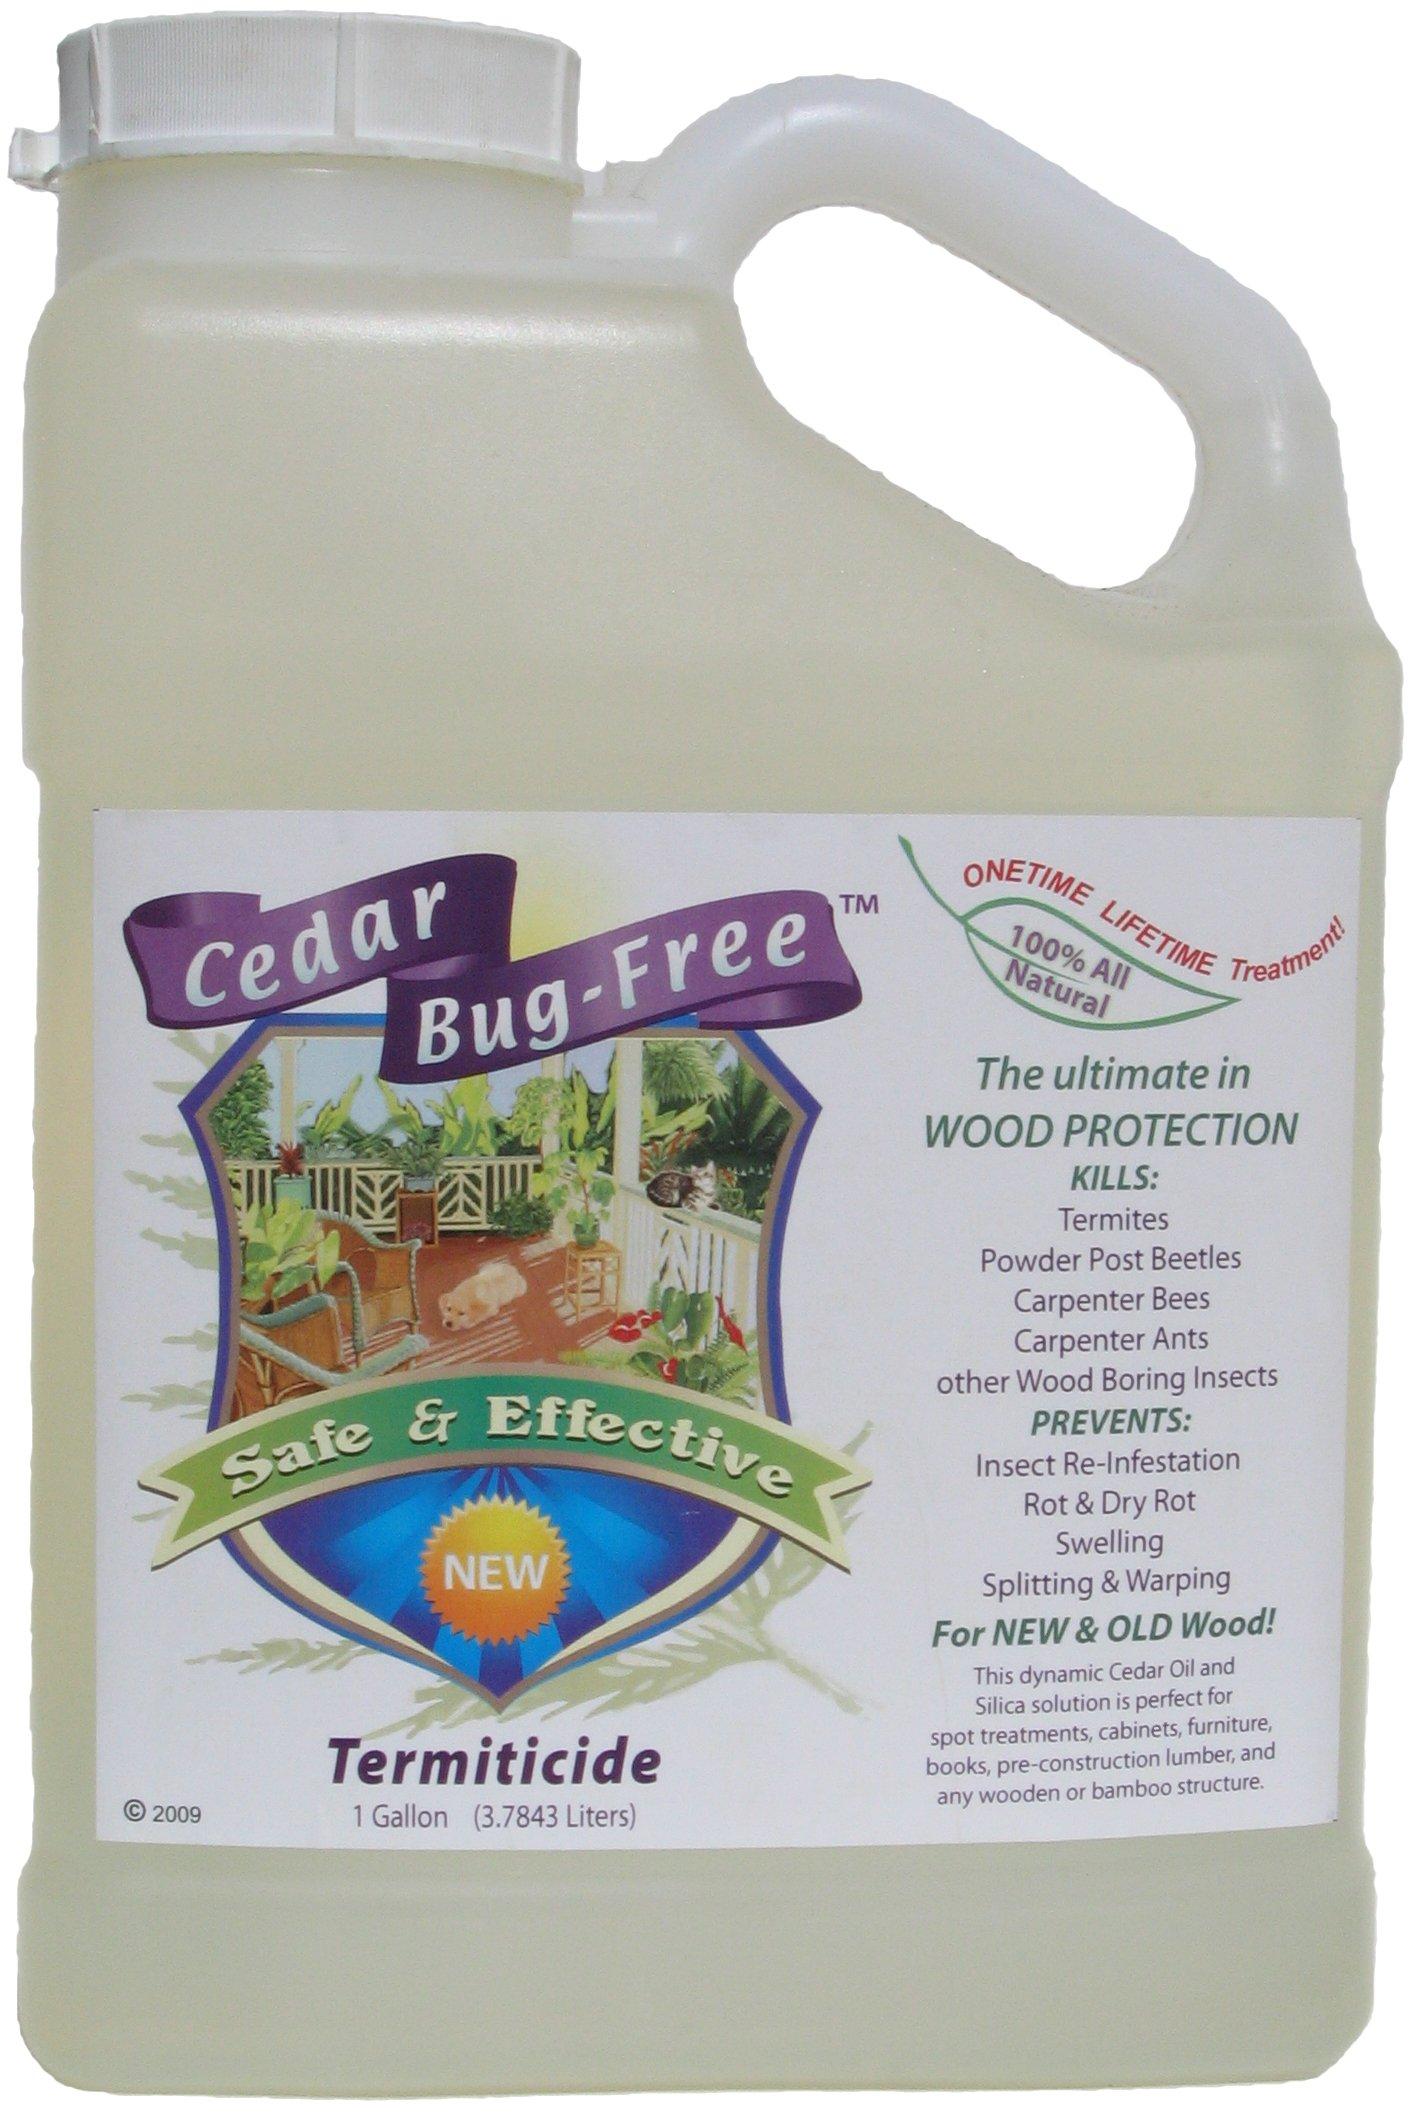 Termite Control - Cedar Bug-Free Termiticide. Natural Termite Treatment. Termite Spray - 1 gallon by Cedar Bug-Free